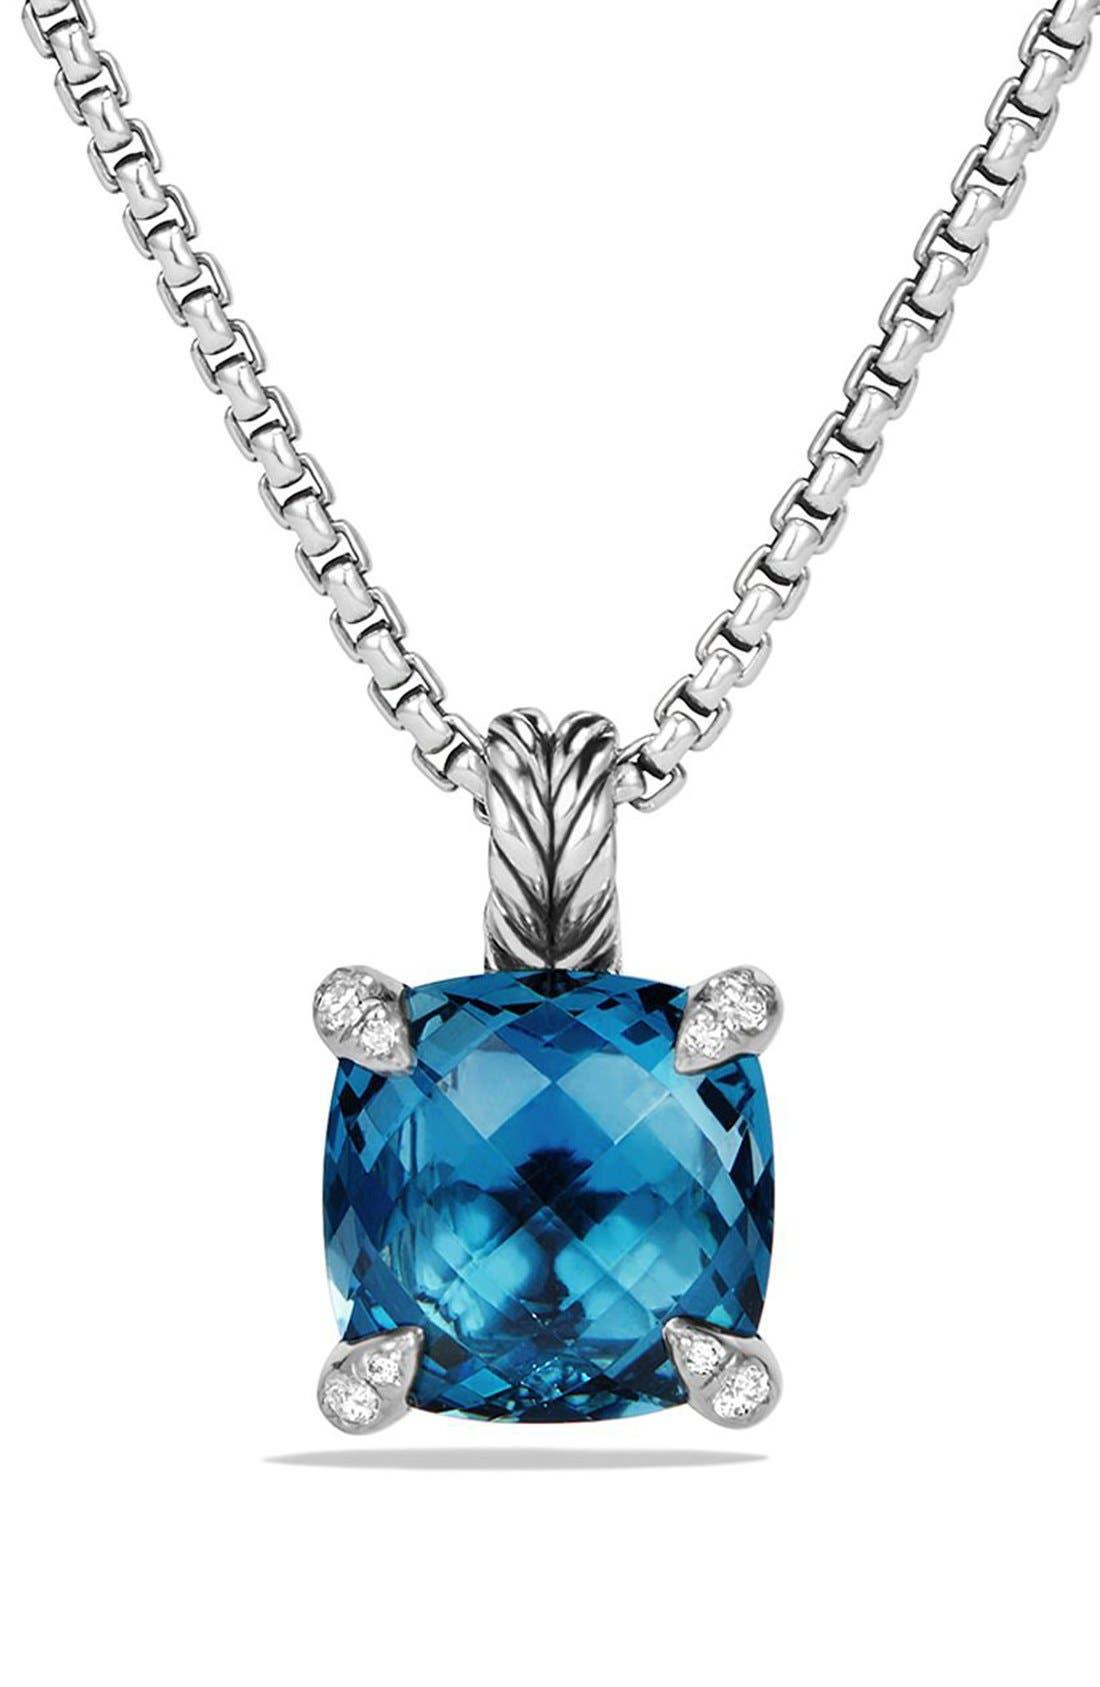 'Châtelaine' Pendant Necklace with Semiprecious Stone & Diamonds,                             Main thumbnail 1, color,                             SILVER/ HAMPTON BLUE TOPAZ